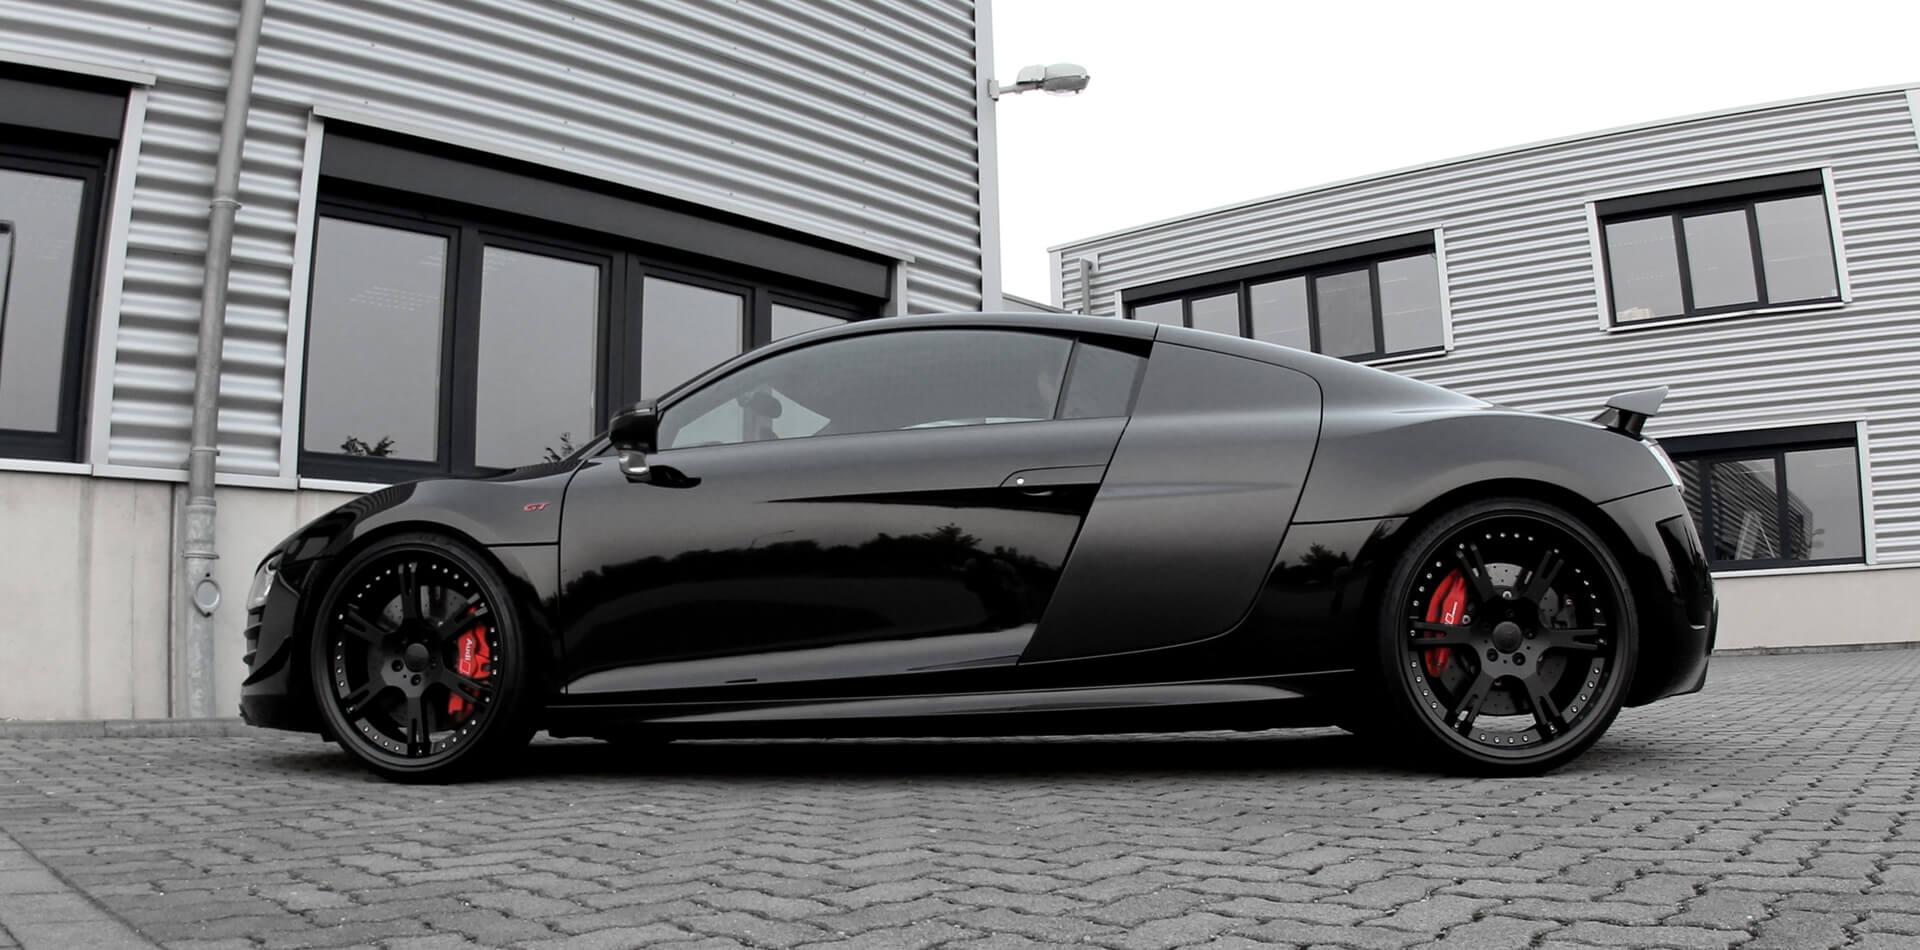 Audi_R8_GT_Tuning